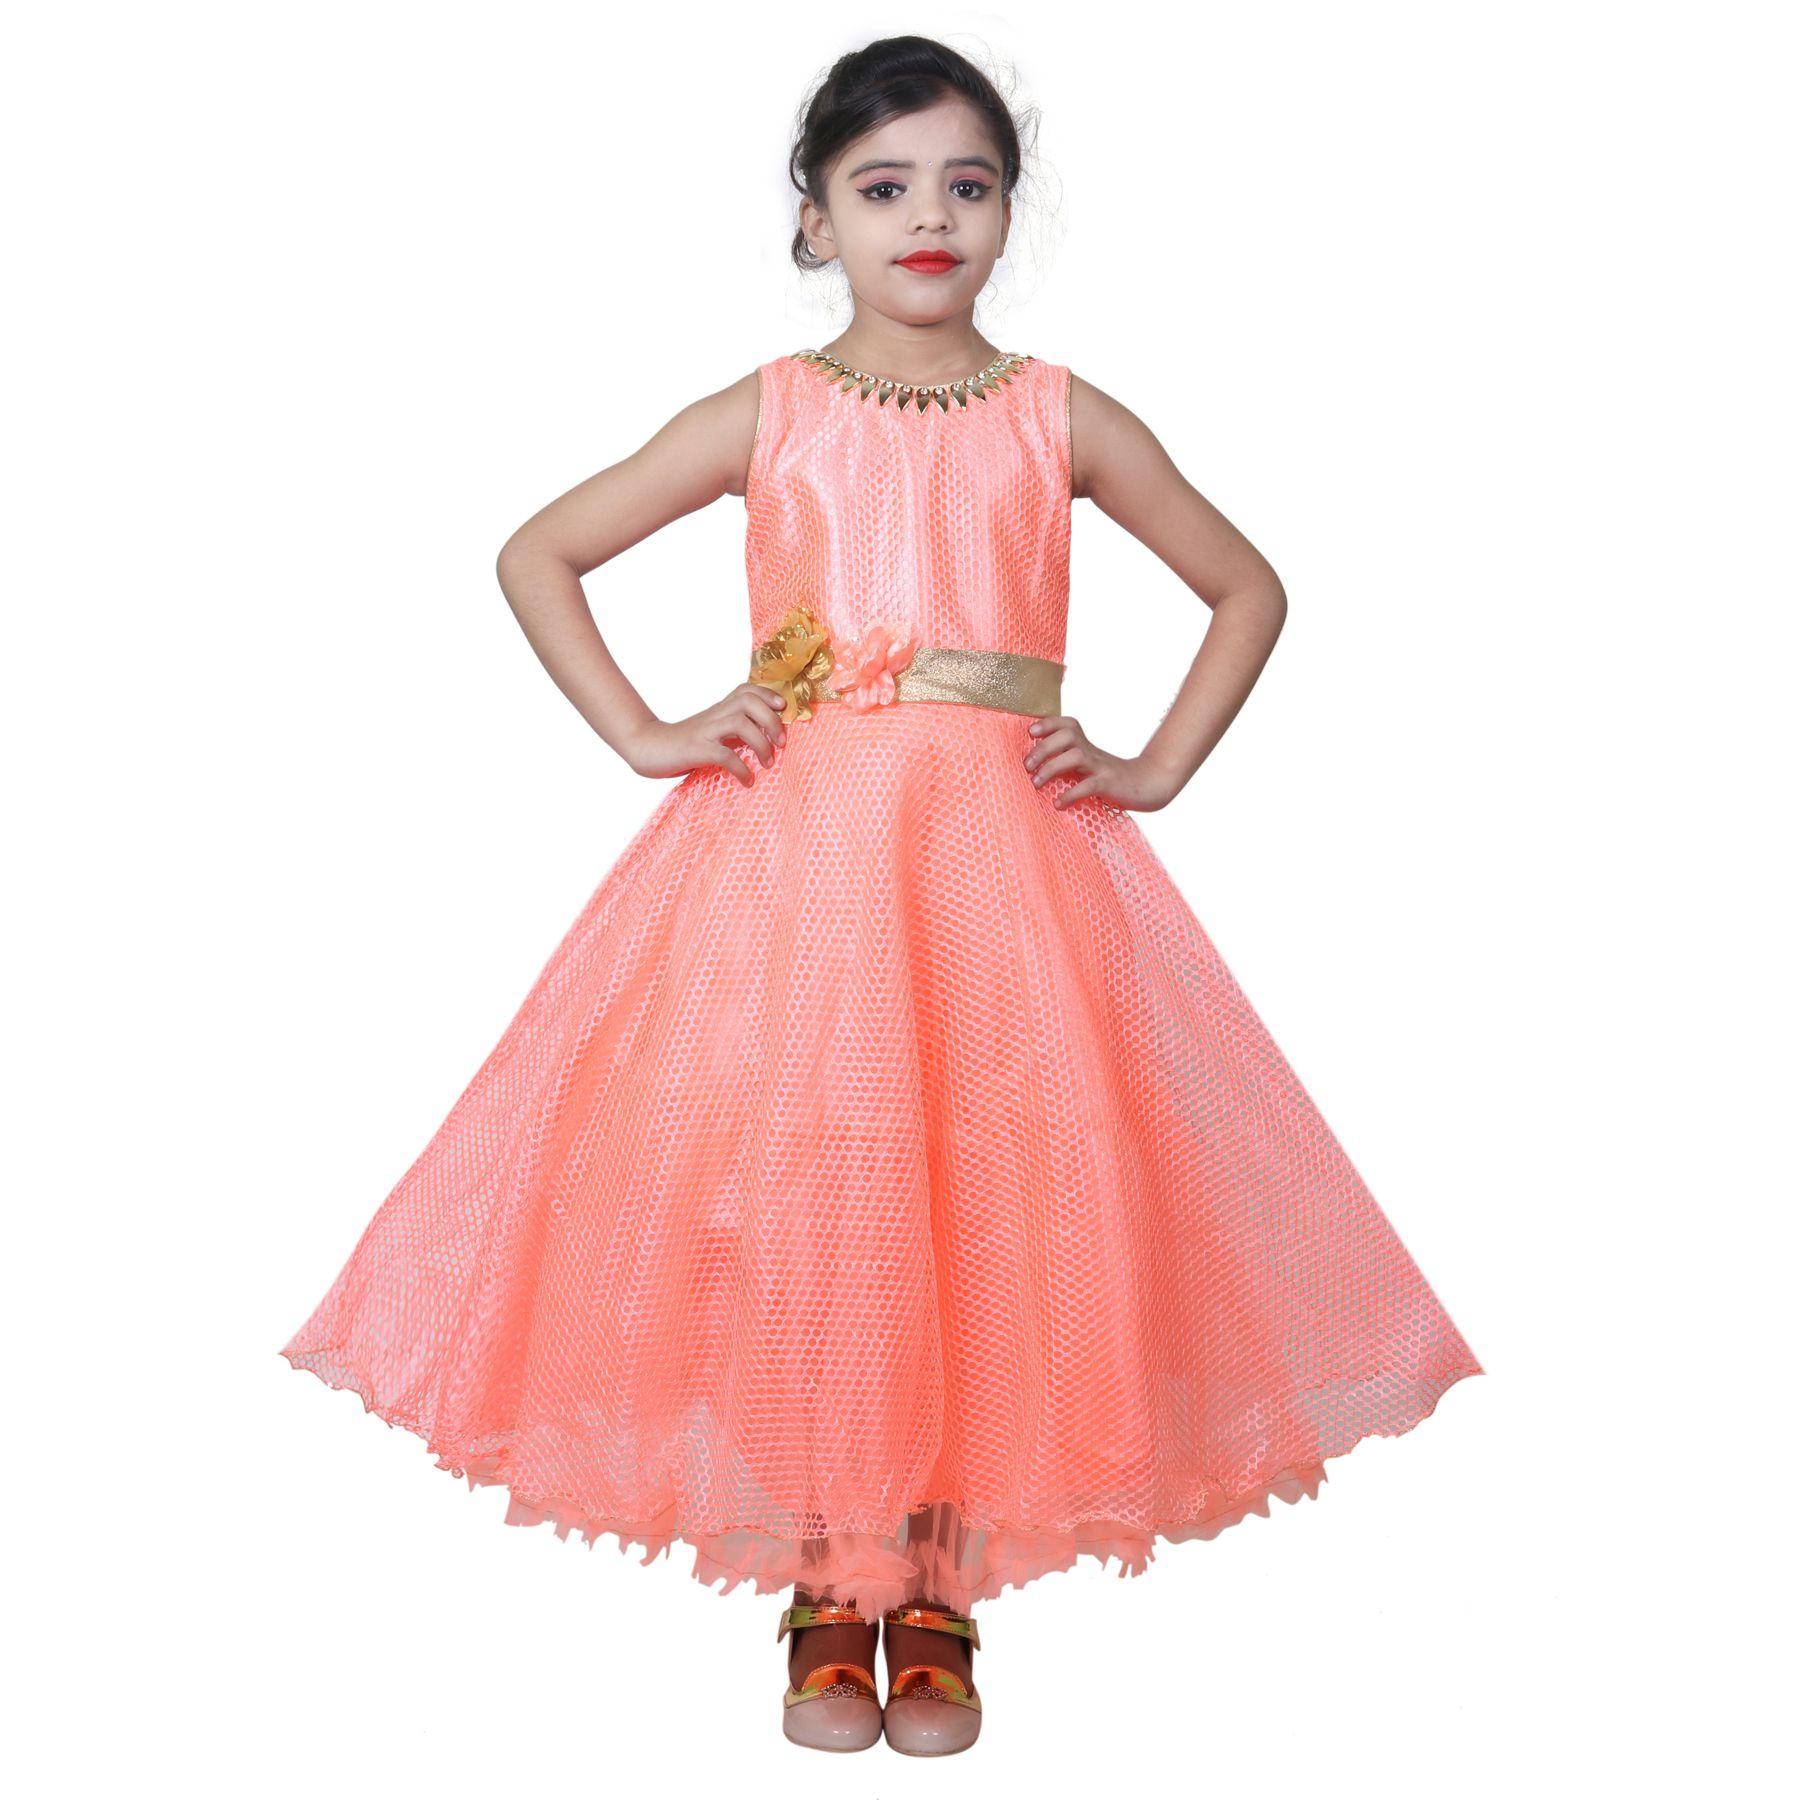 KBKIDSWEAR Girl's Self Design Party Wear Premium Net Gown